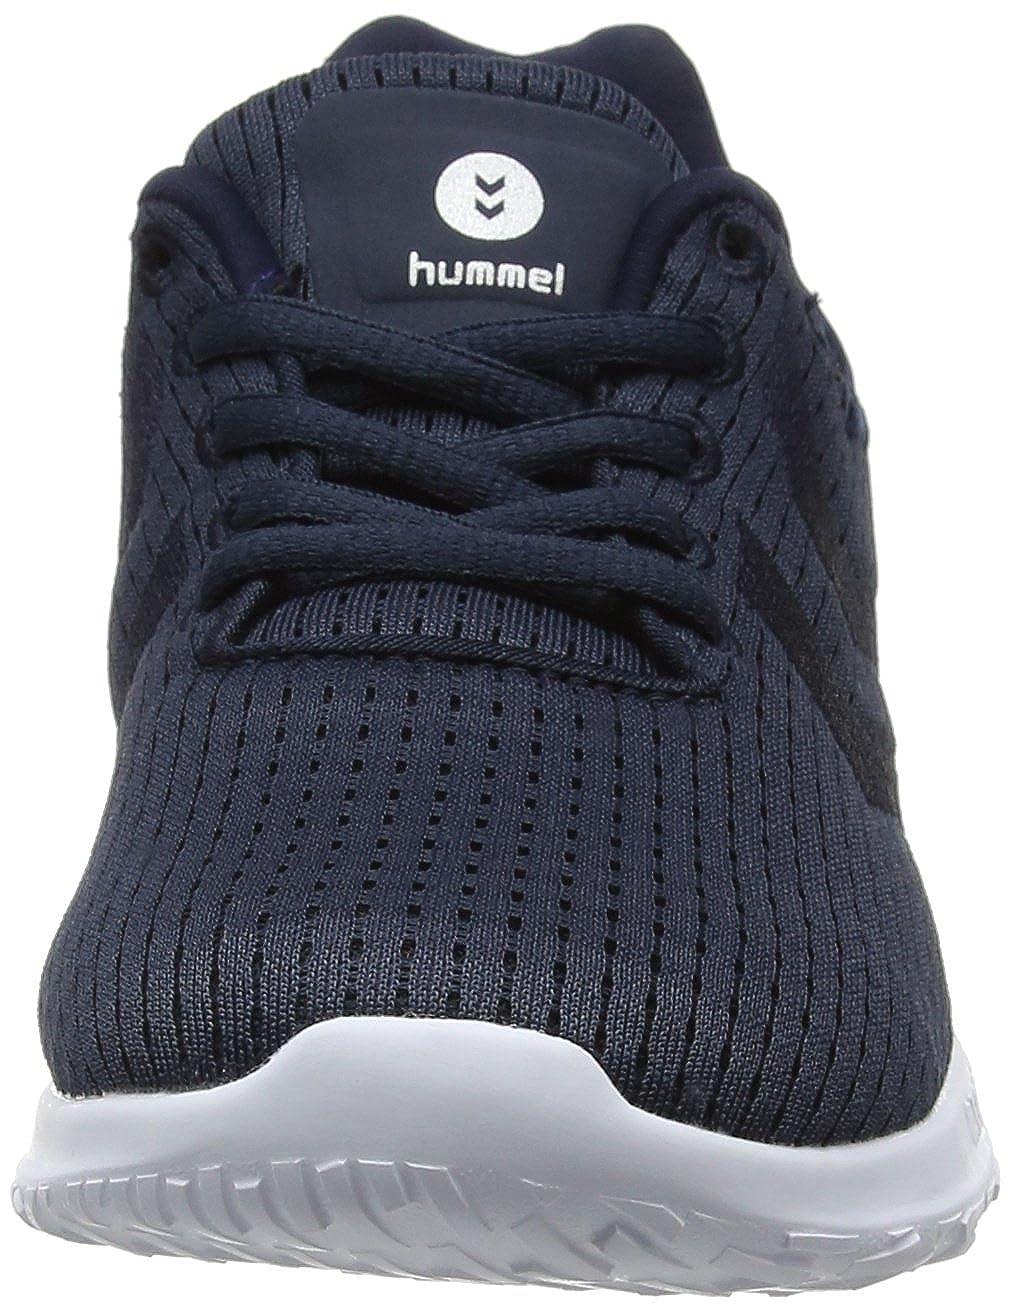 De Fitness Adulte Breather Actus Mixte Chaussures Hummel vnxOWwx